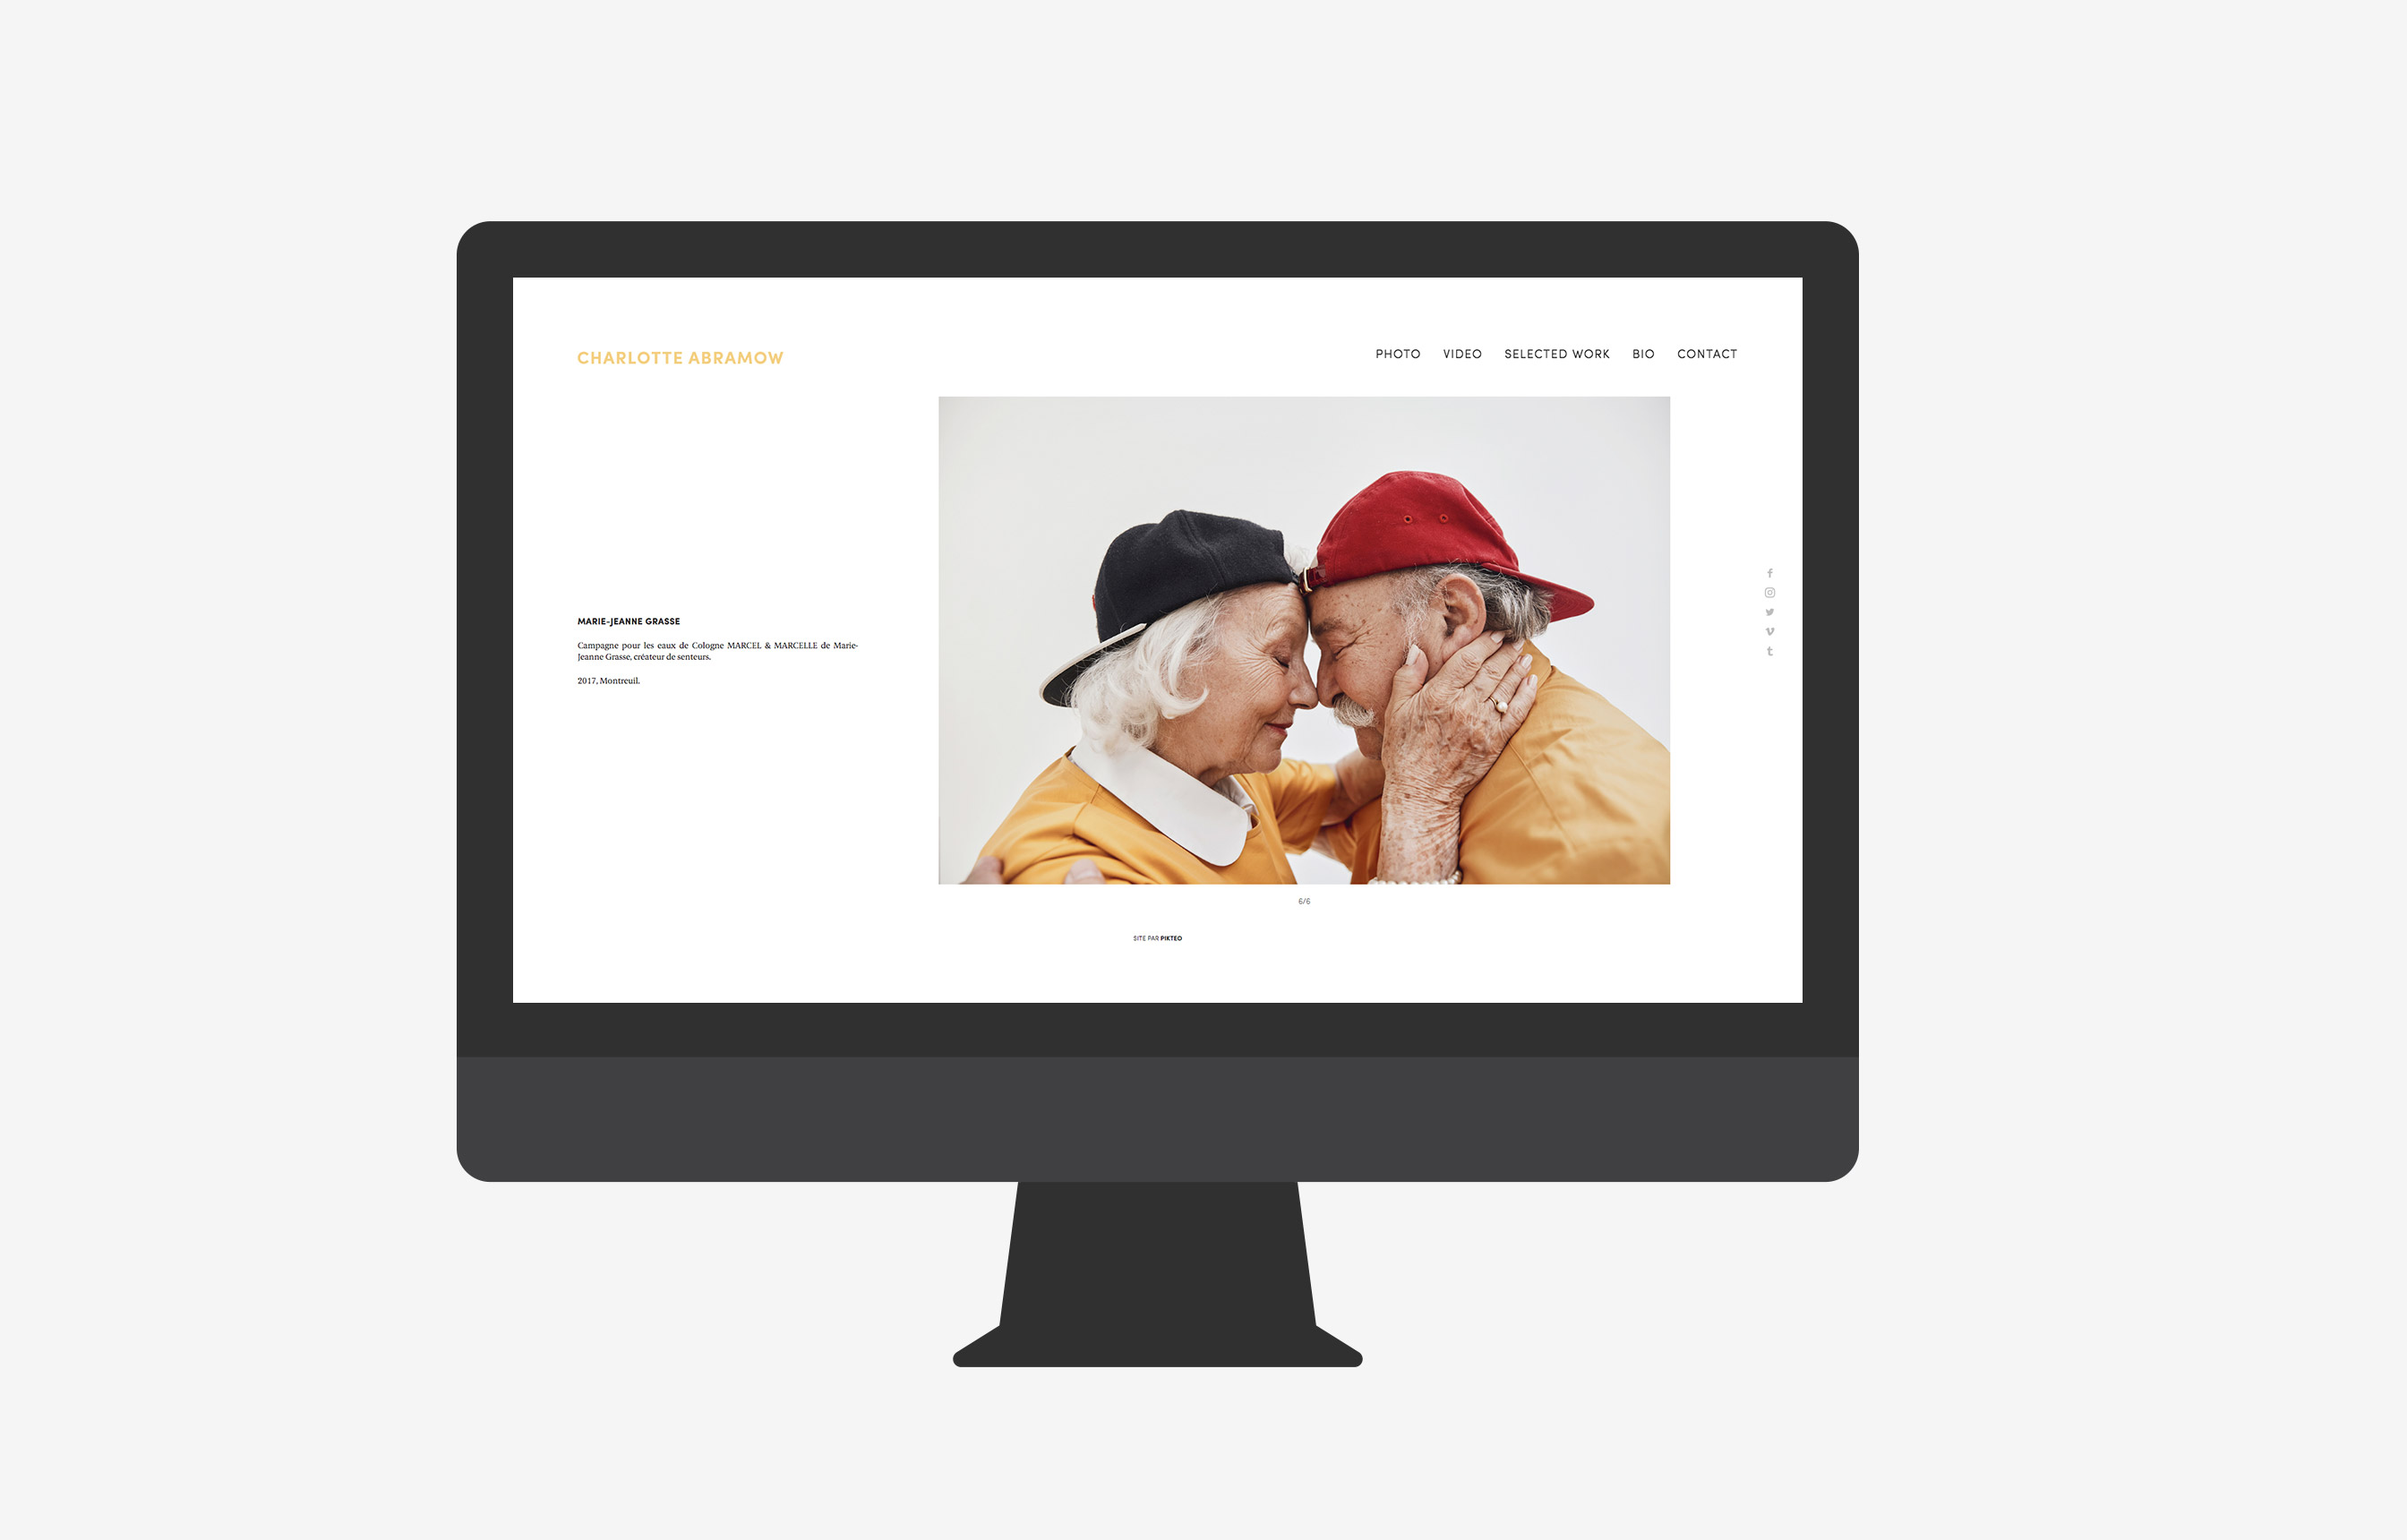 03-charlotte-abramow-pikteo-webdesign-graphic-design-freelance-paris-bruxelles-londres